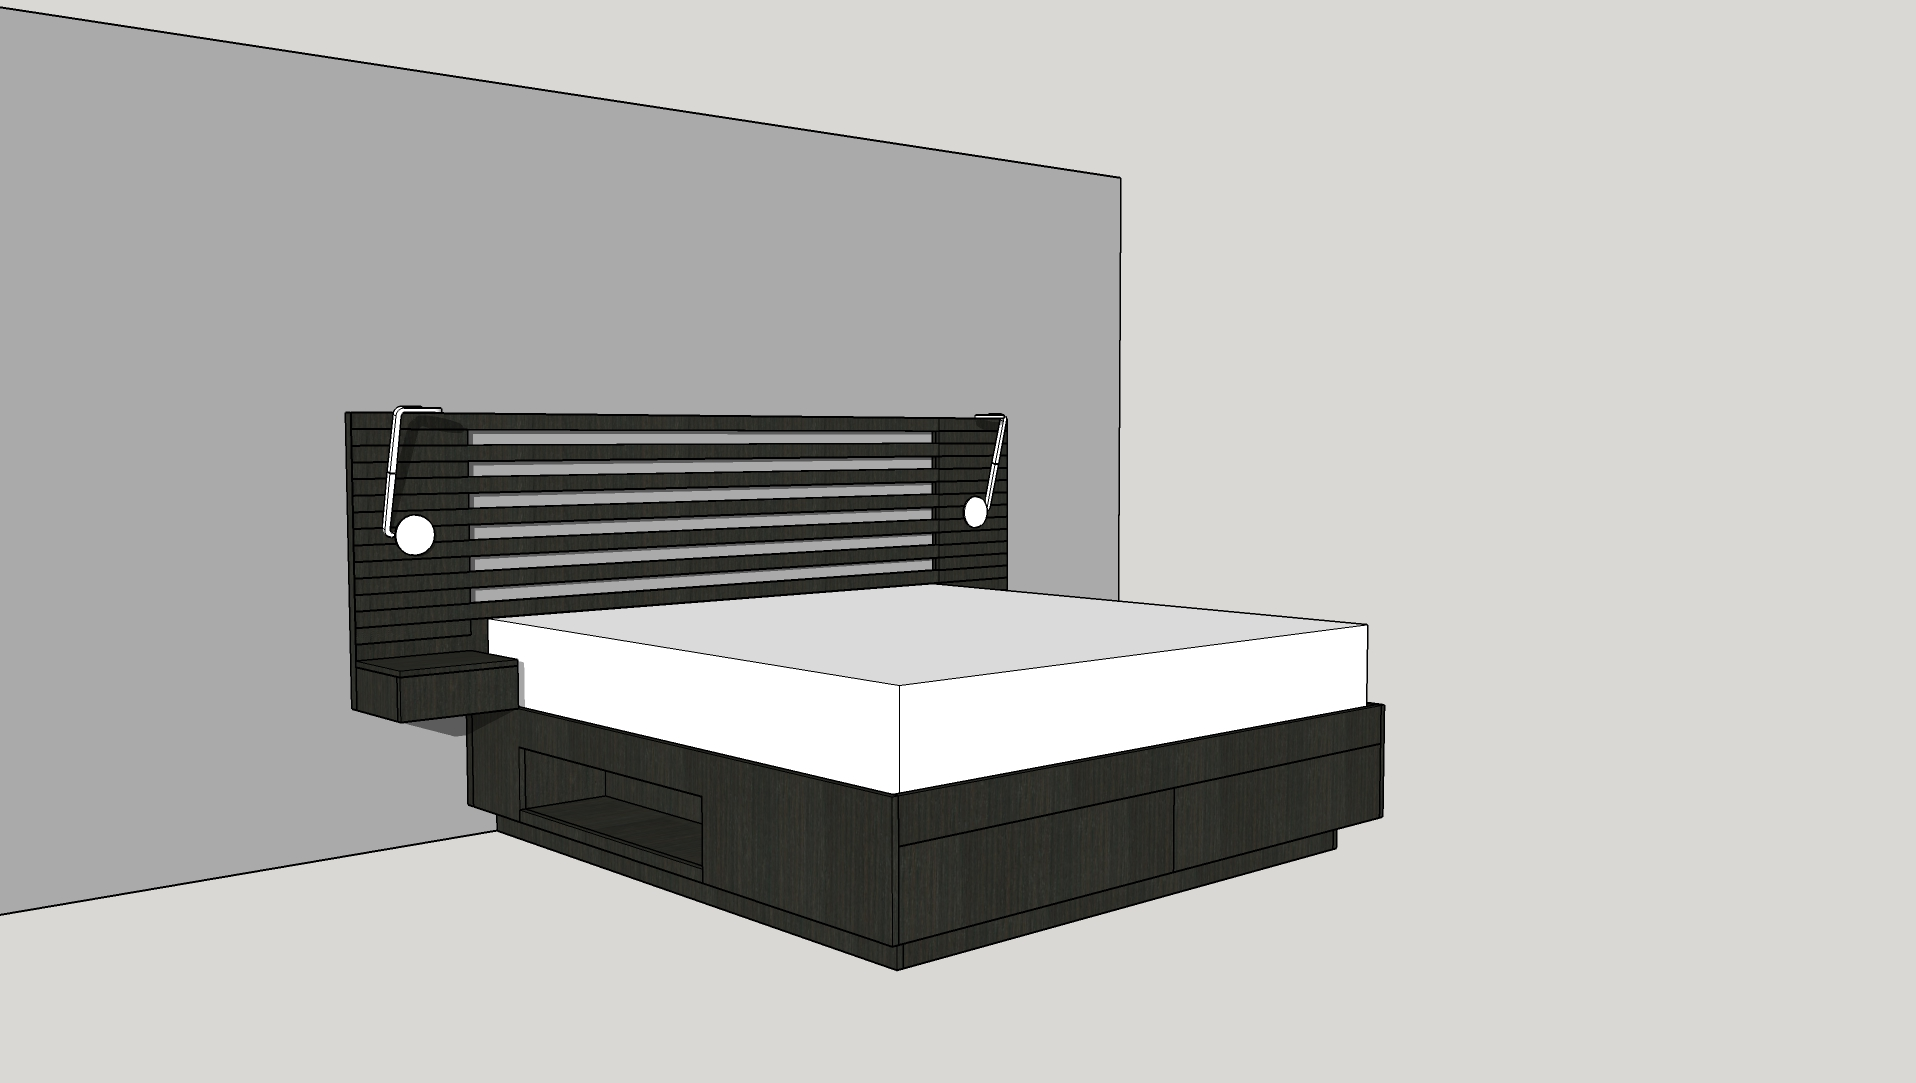 21 Barton Mst Bed_2.0_Persp 3